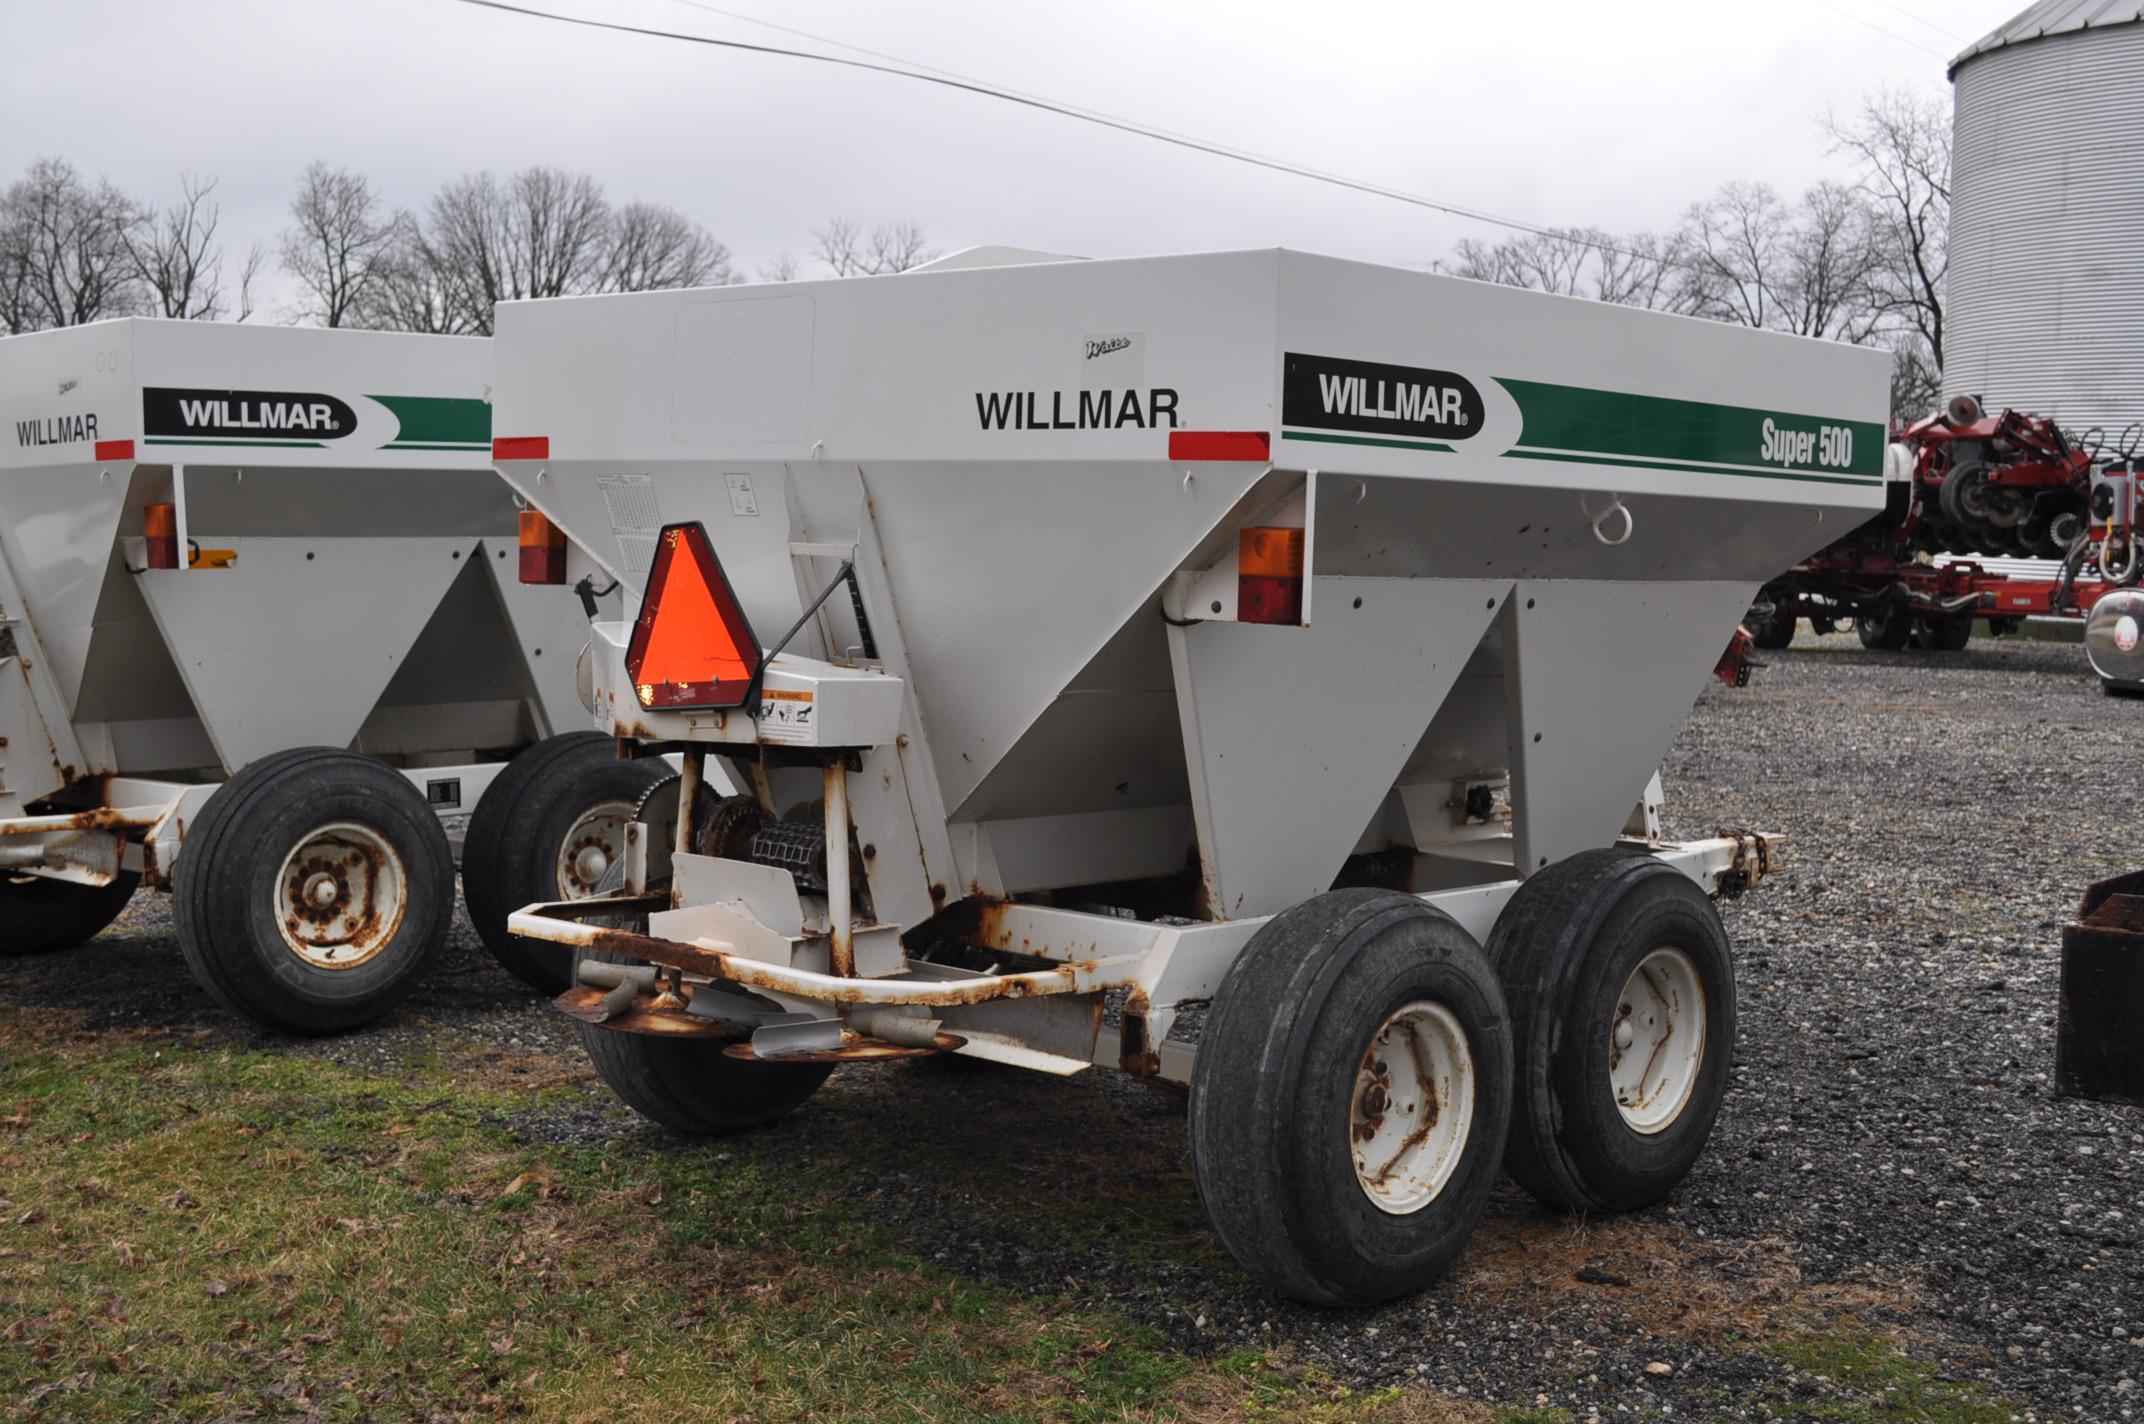 Wilmar Super 500 dry fertilizer spreaders, tandem axles, 12.5L-15 tires, twin spreaders, 540 pto - Image 3 of 12